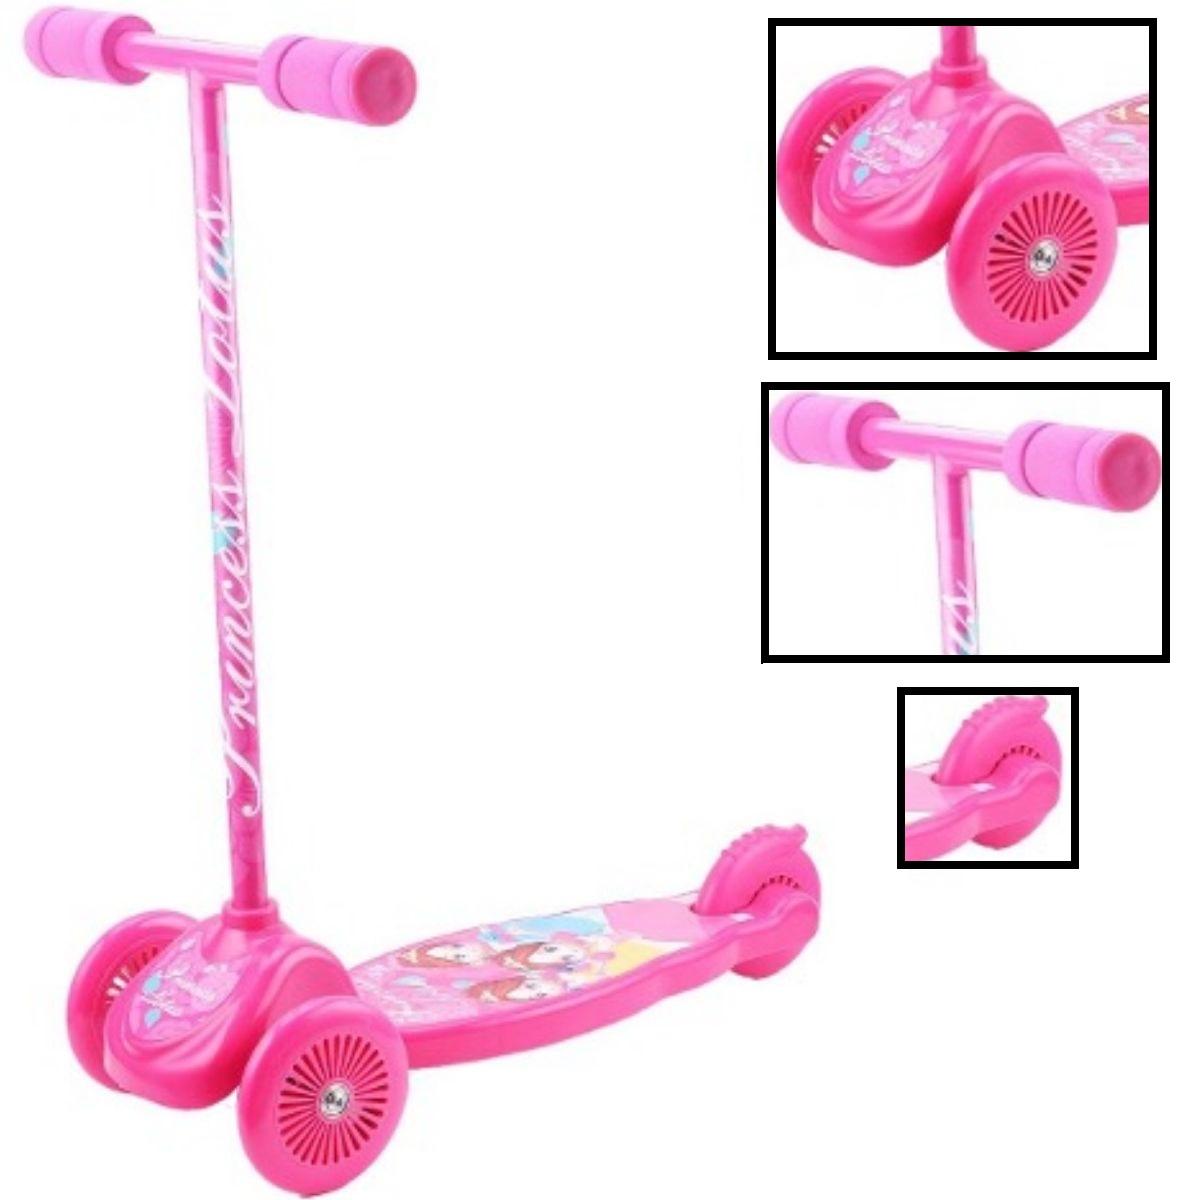 Patinete Infantil Rosa Com 3 rodas - WYT3-05RO-LX